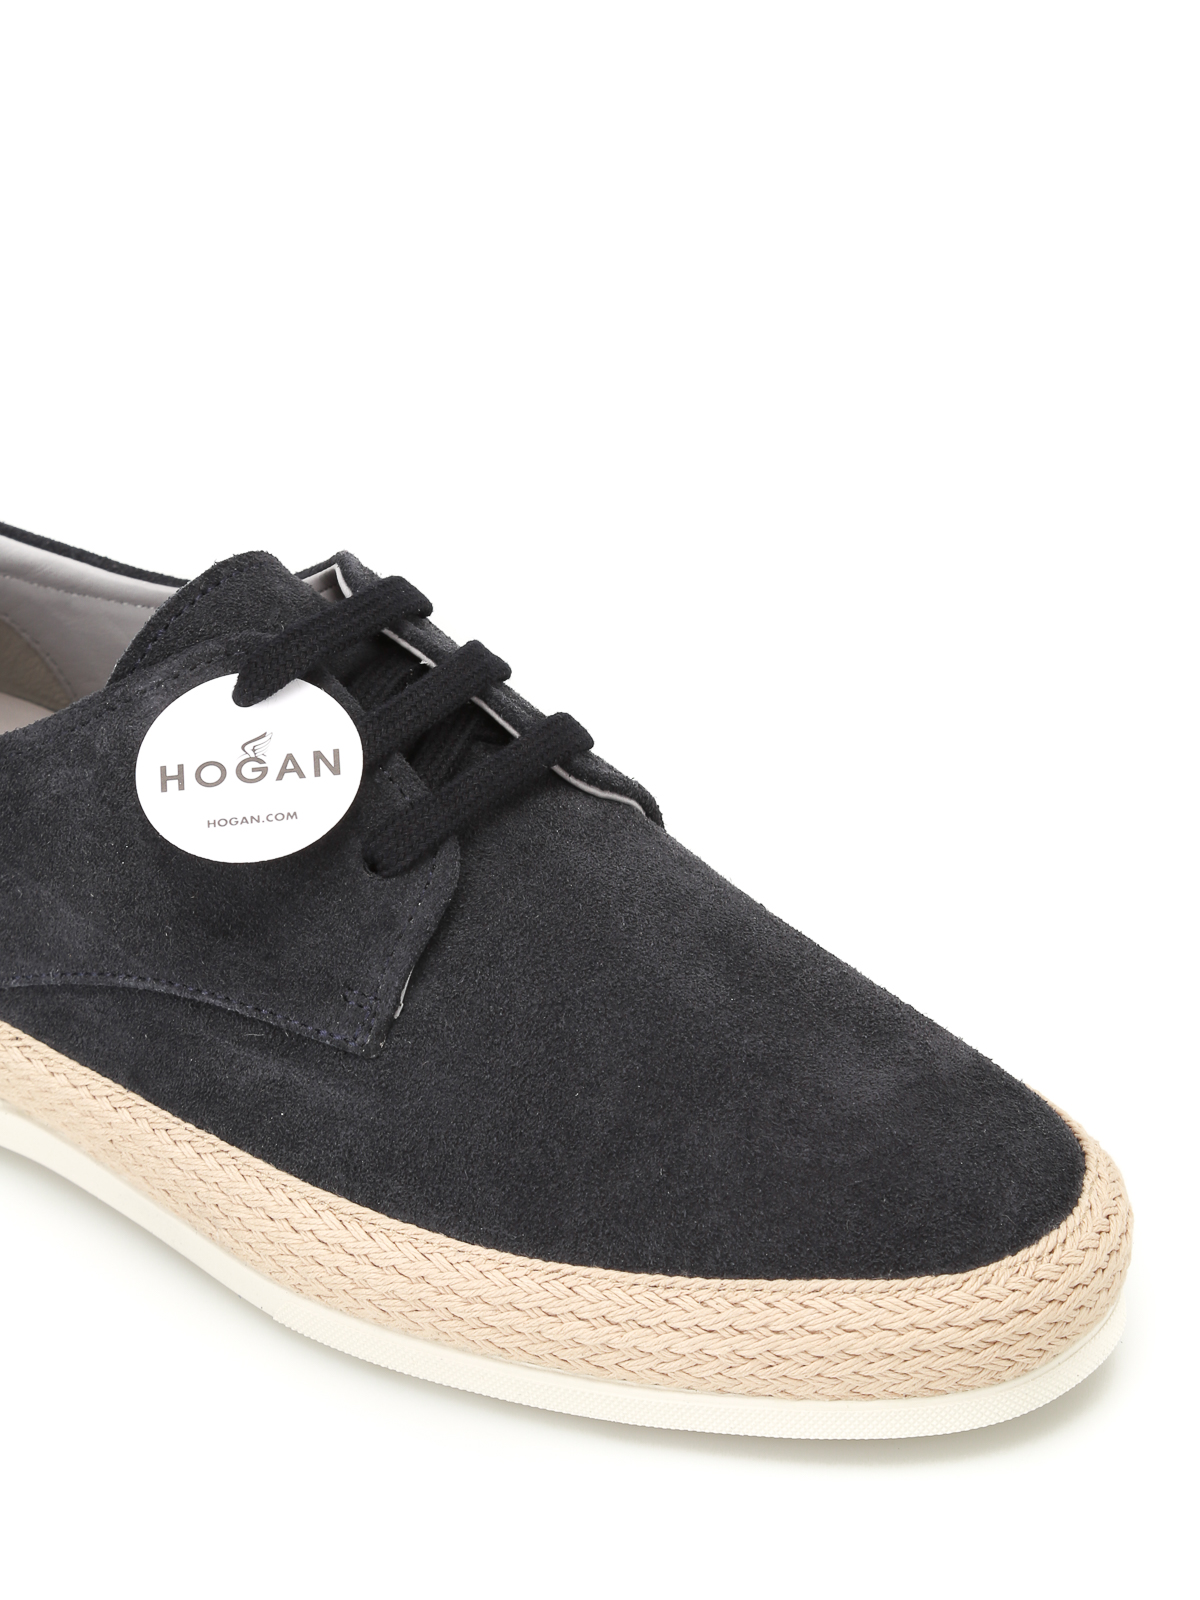 Chaussures Derby H358 Bleu Hogan 0FnuYE